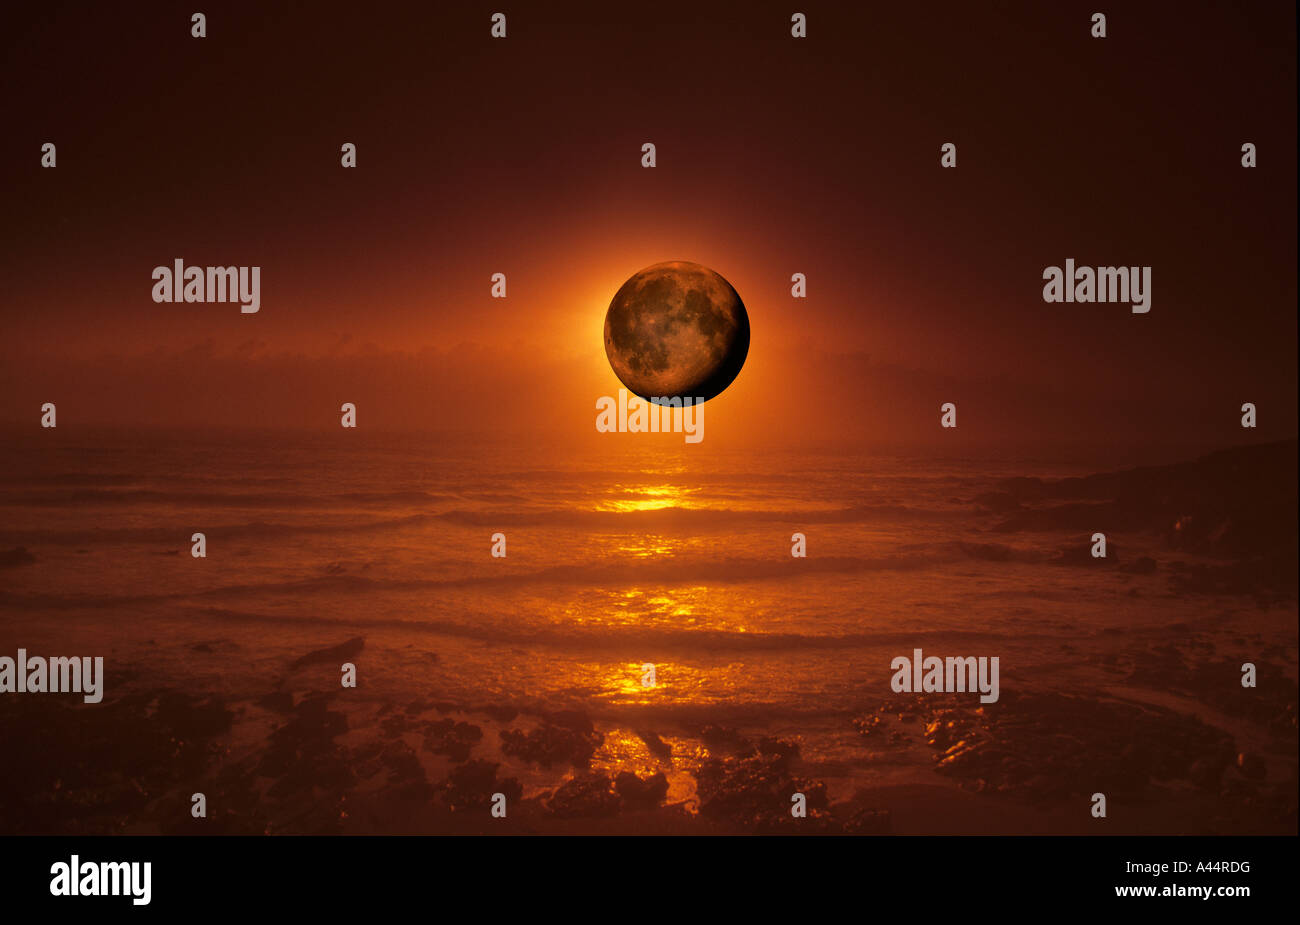 Sunset & Moonrise Over The Atlantic Ocean,Taken In Newquay Cornwall UK. Stock Photo